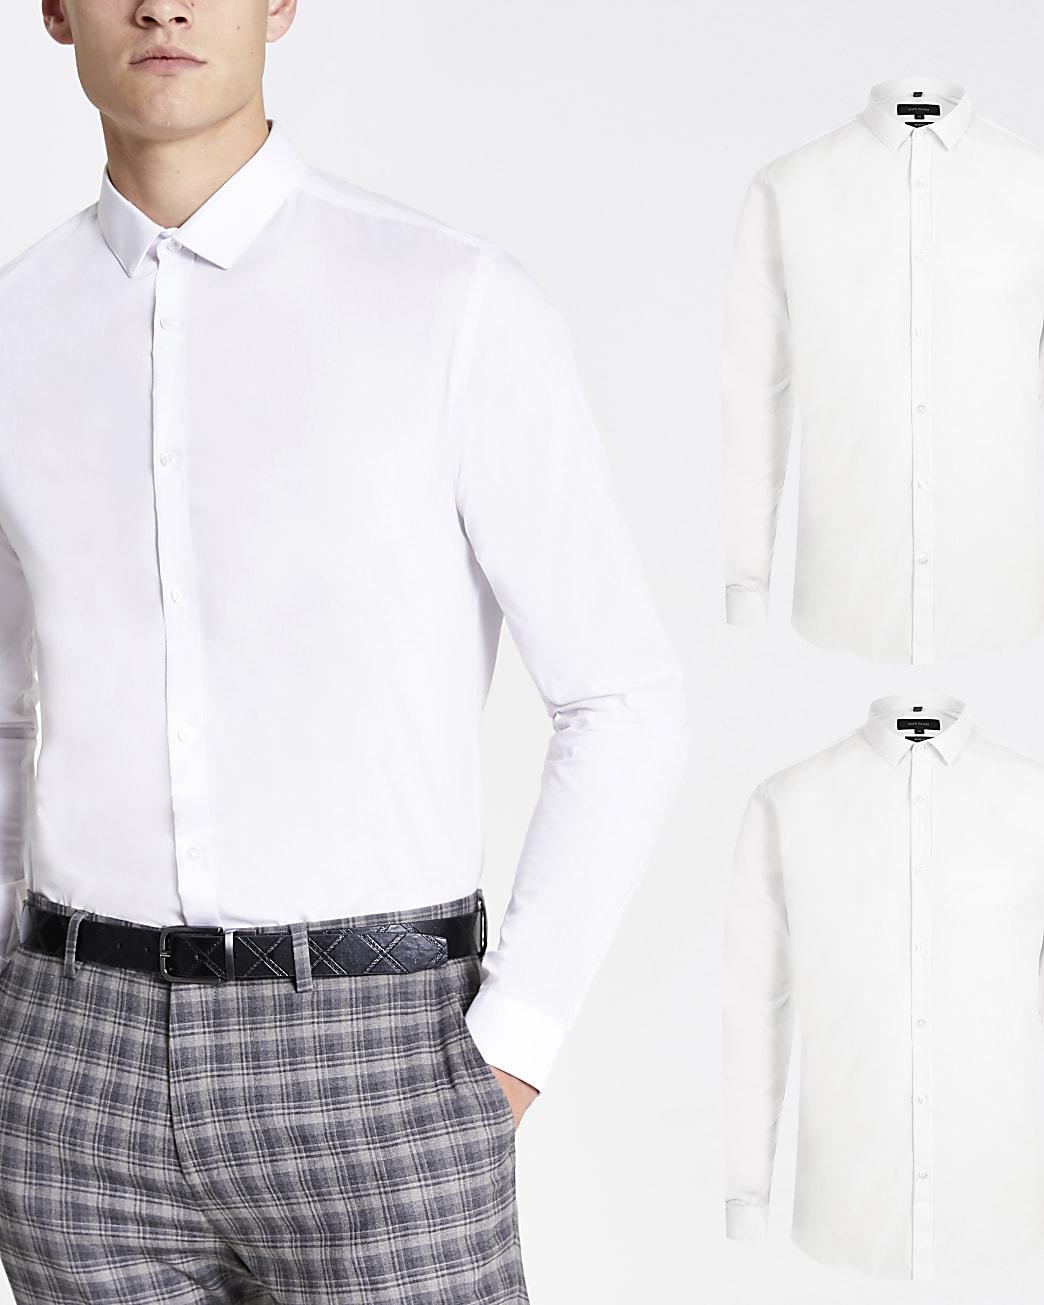 White slim fit long sleeve shirt 2 pack